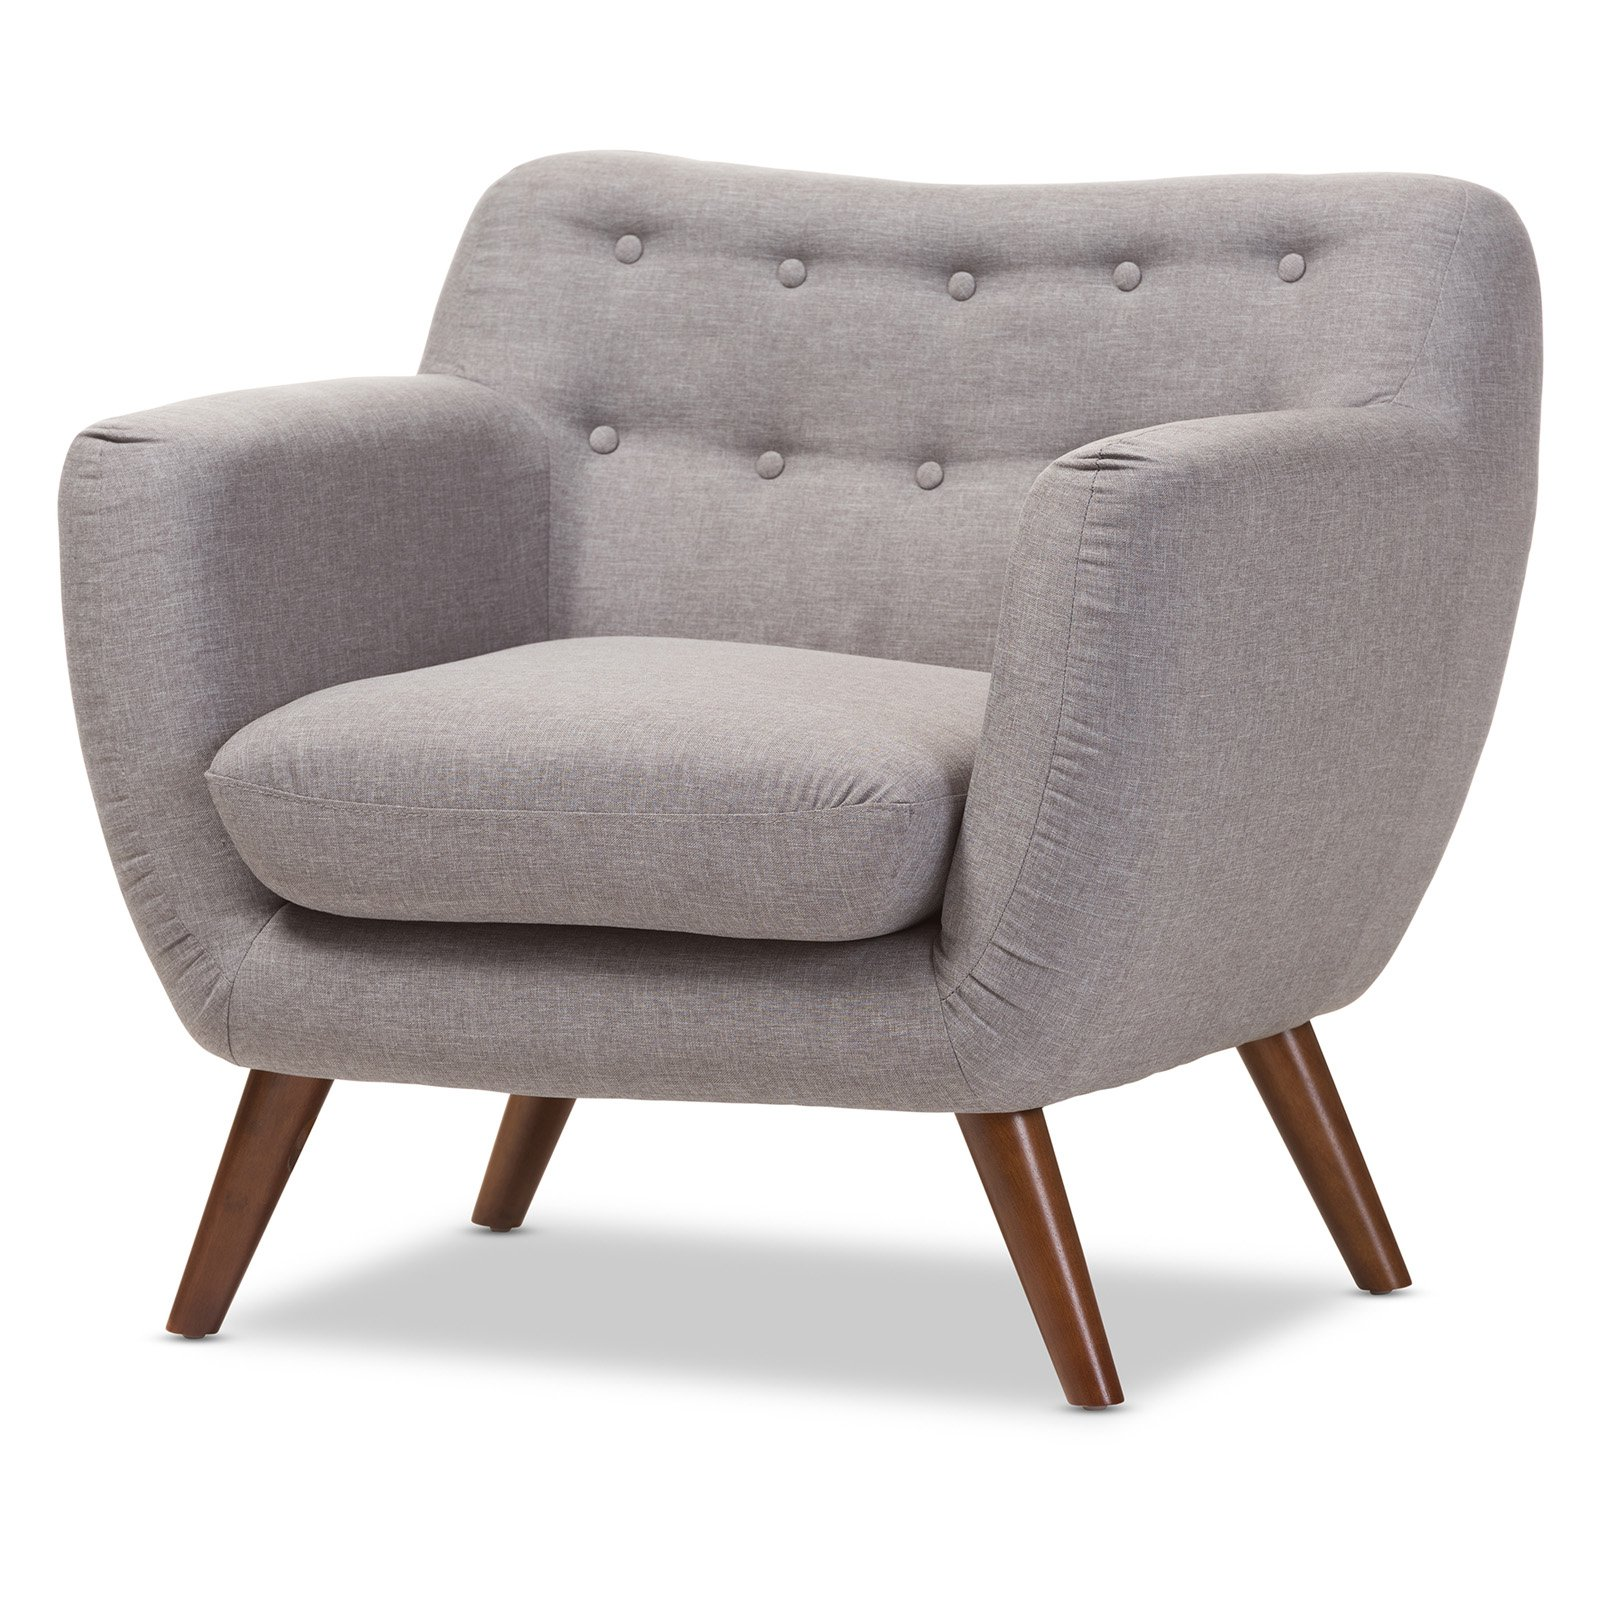 Baxton Studio Harper Mid-Century Modern Walnut Finish Button Tufted Upholstered Armchair by